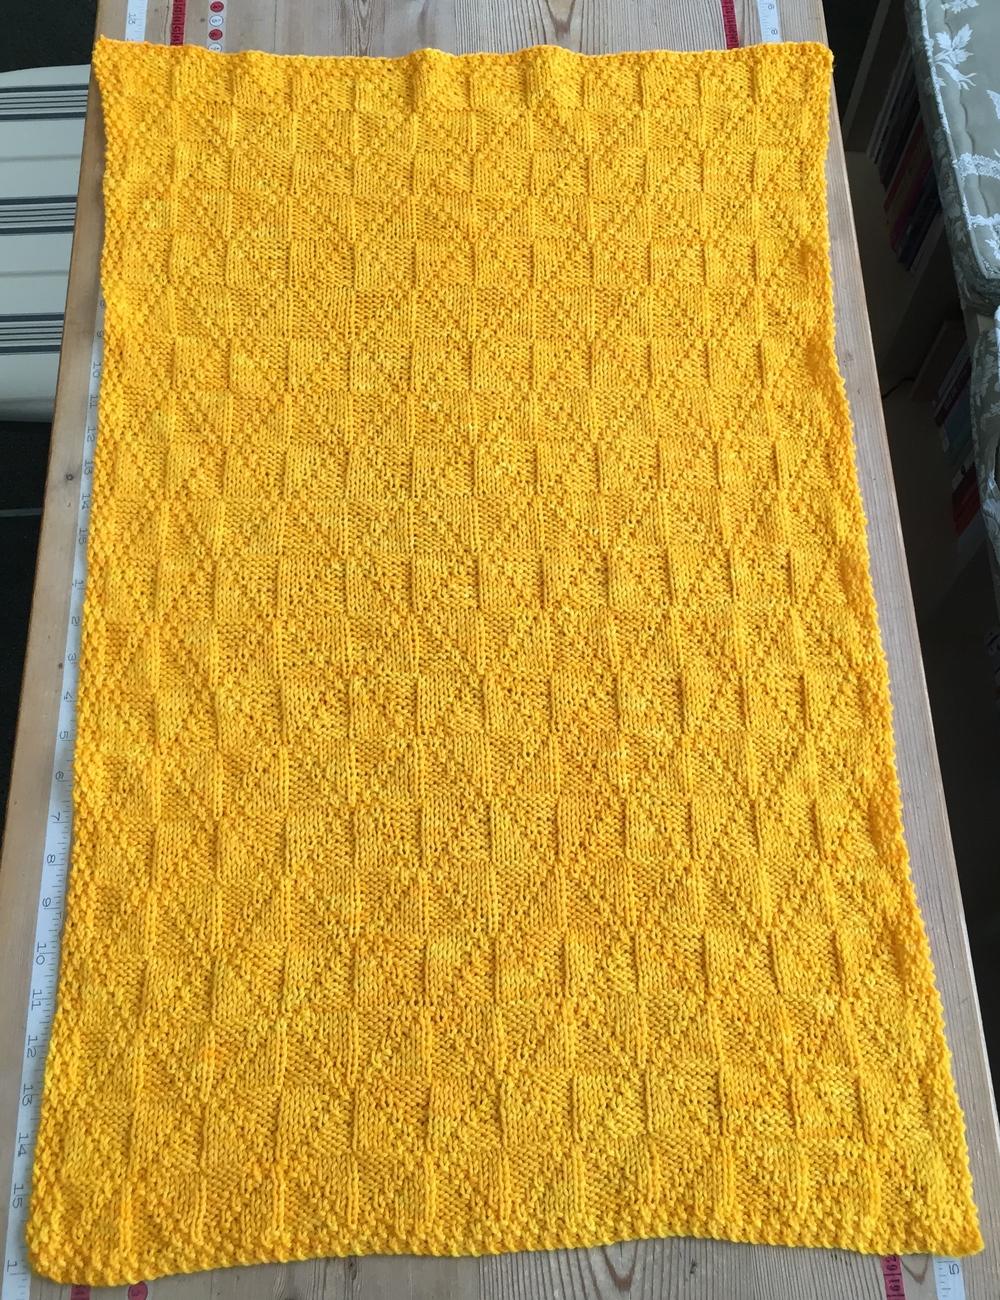 The STELLA pinwheel blanket version 3 ... Miss Babs YOWZA ... one skein!